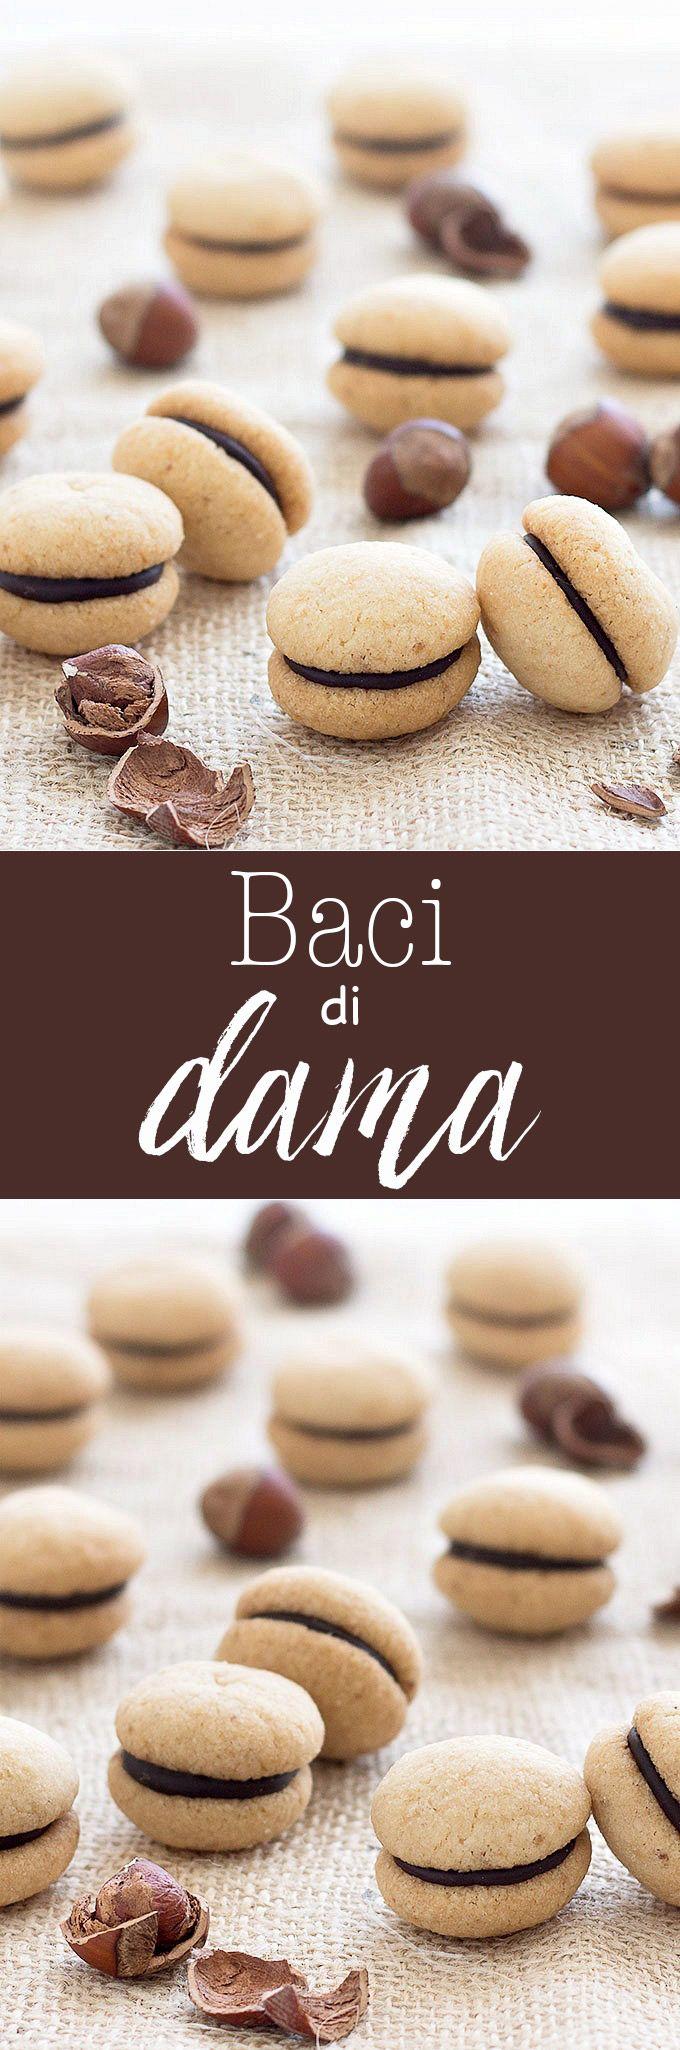 Baci di Dama ( Italian Hazelnut Cookies): buttery hazelnut cookies filled with a dollop of dark chocolate or Nutella  recipe  dessert  easy